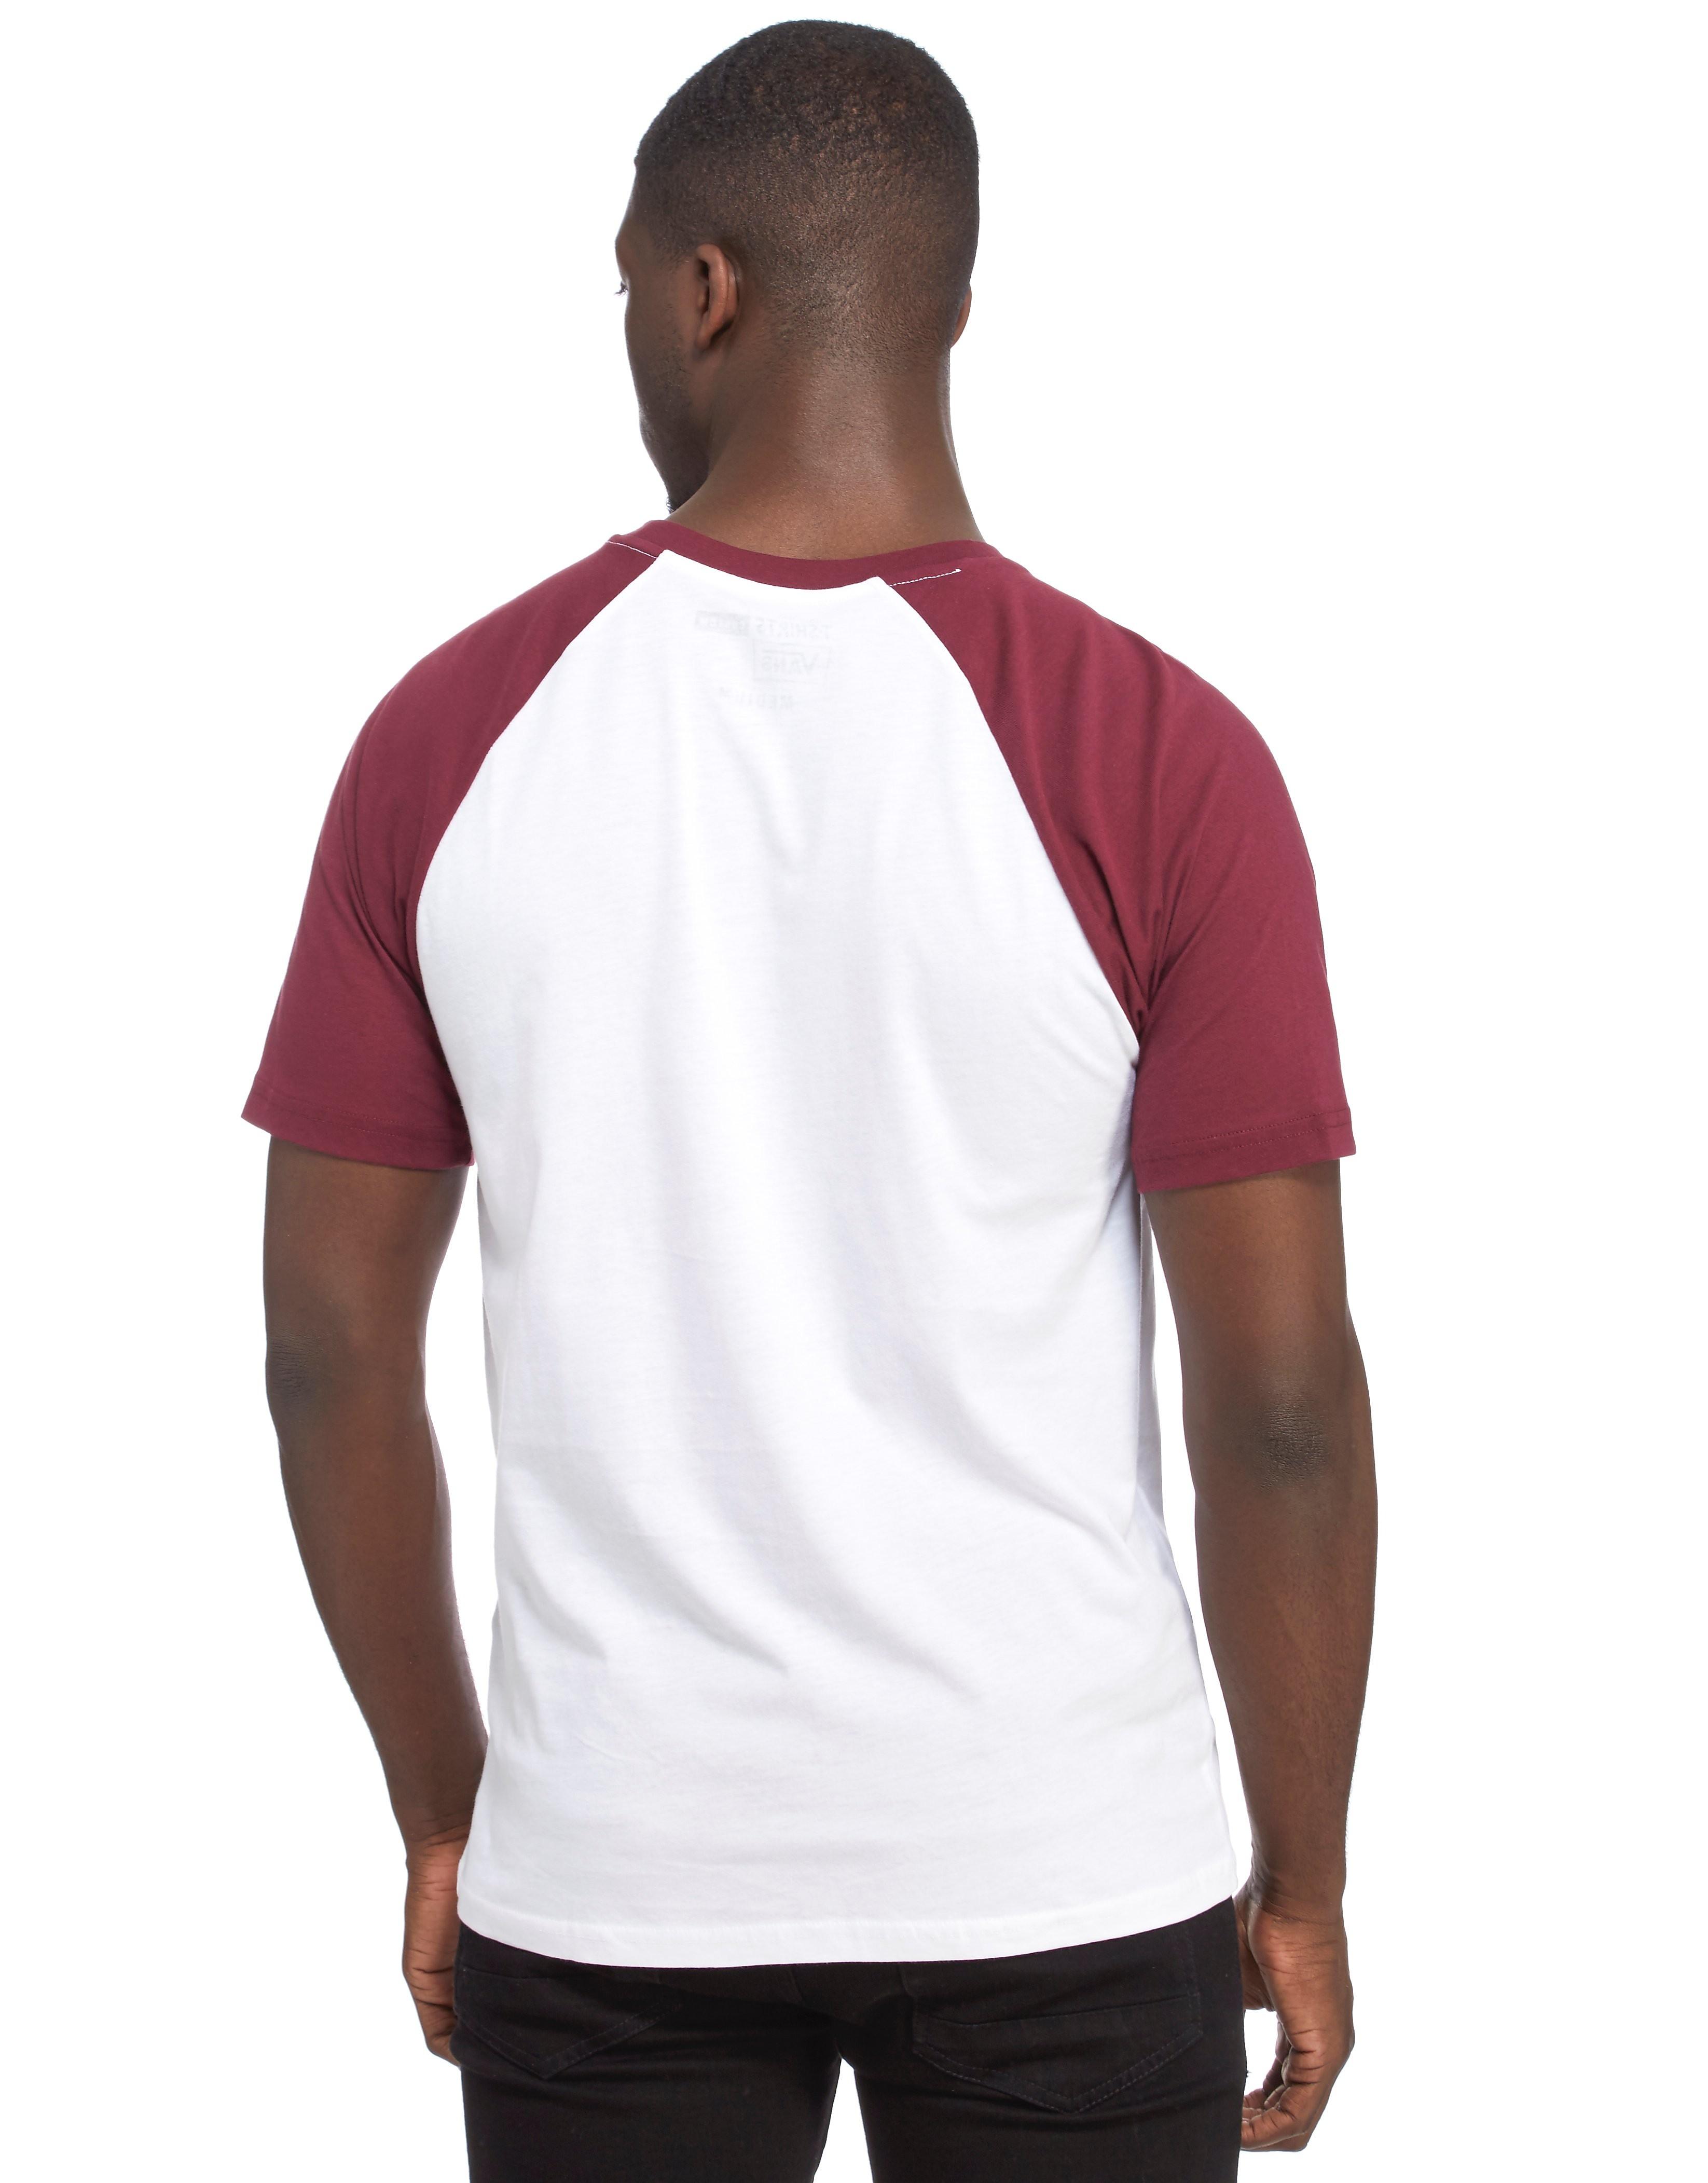 Vans Classic Raglan T-Shirt